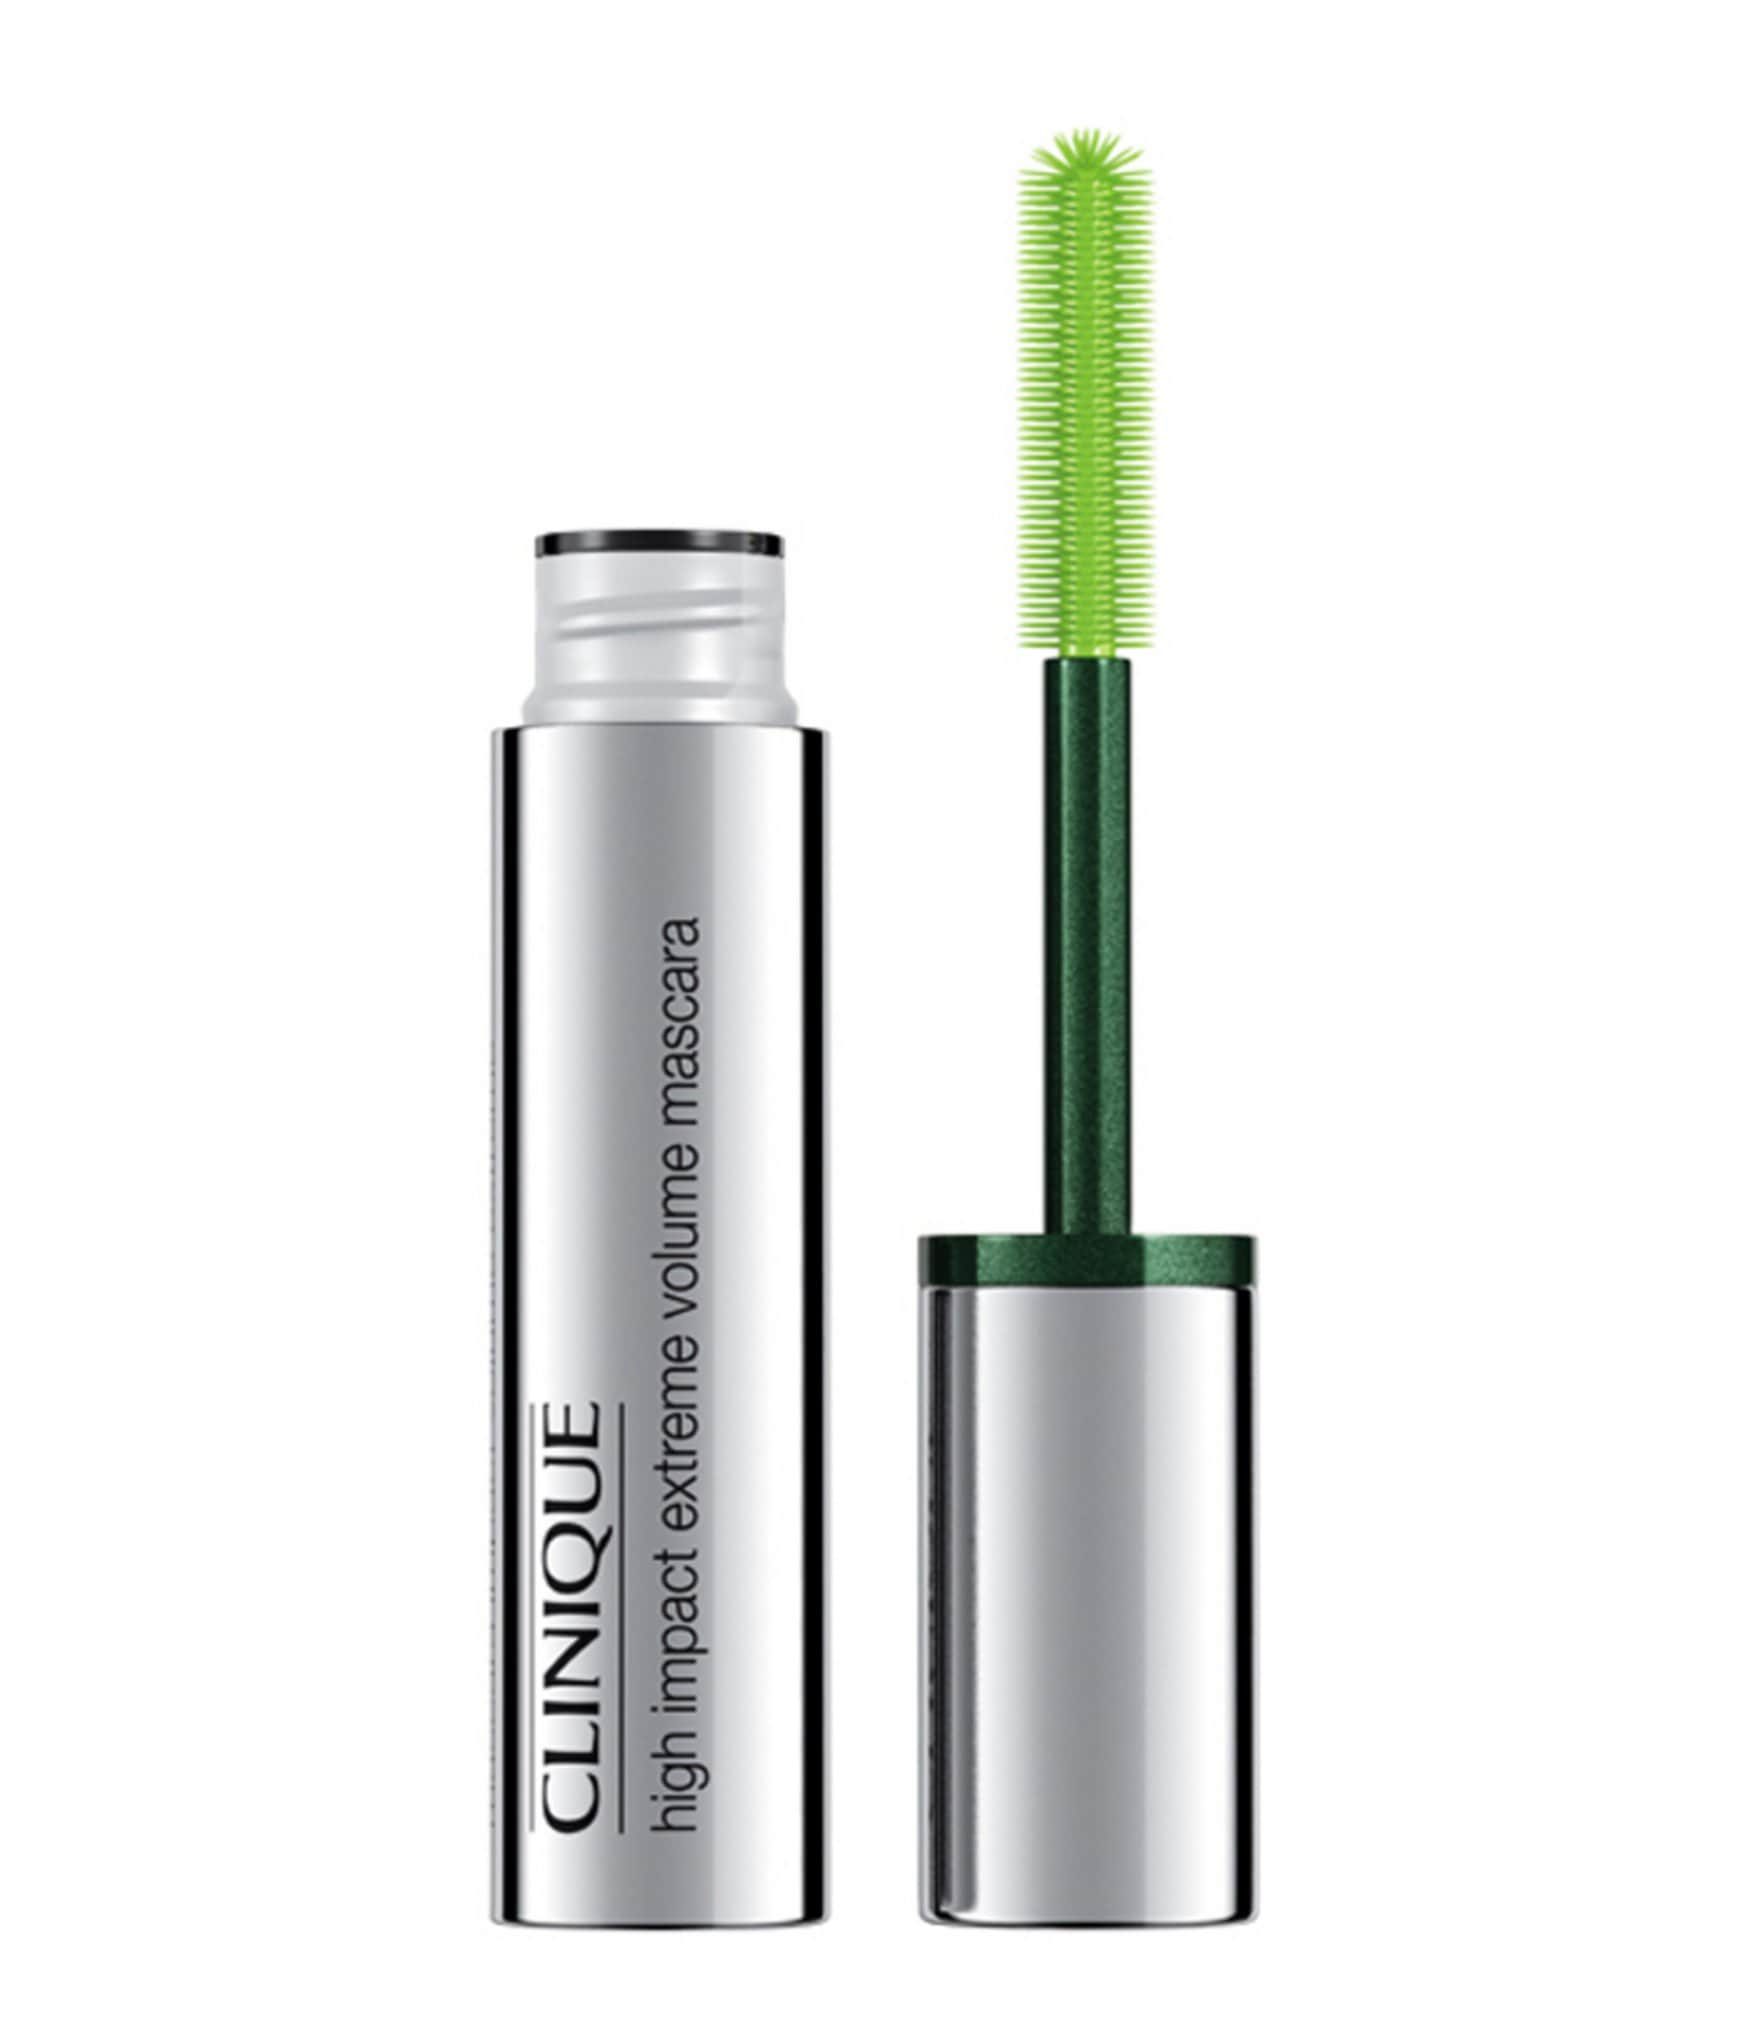 a260ccdd79b Clinique Mascara & Waterproof Mascara | Dillard's